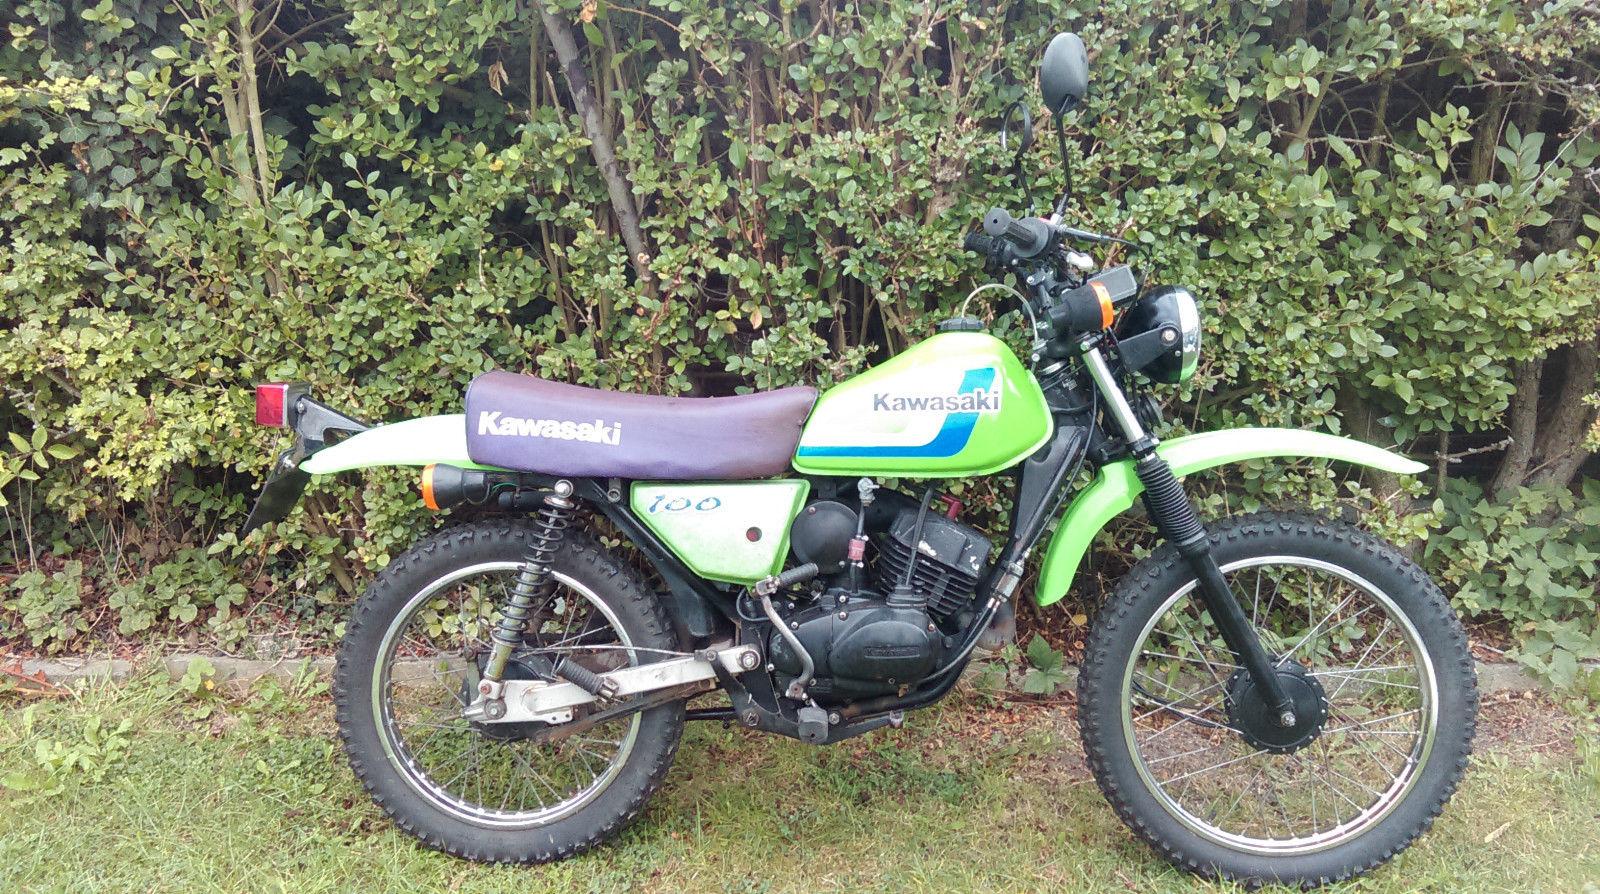 Wiring Diagram 2001 Kawasaki Ke 100 Custom Project 1980 Ke100 Honda 600 F4 Diagrams Get Free Image About